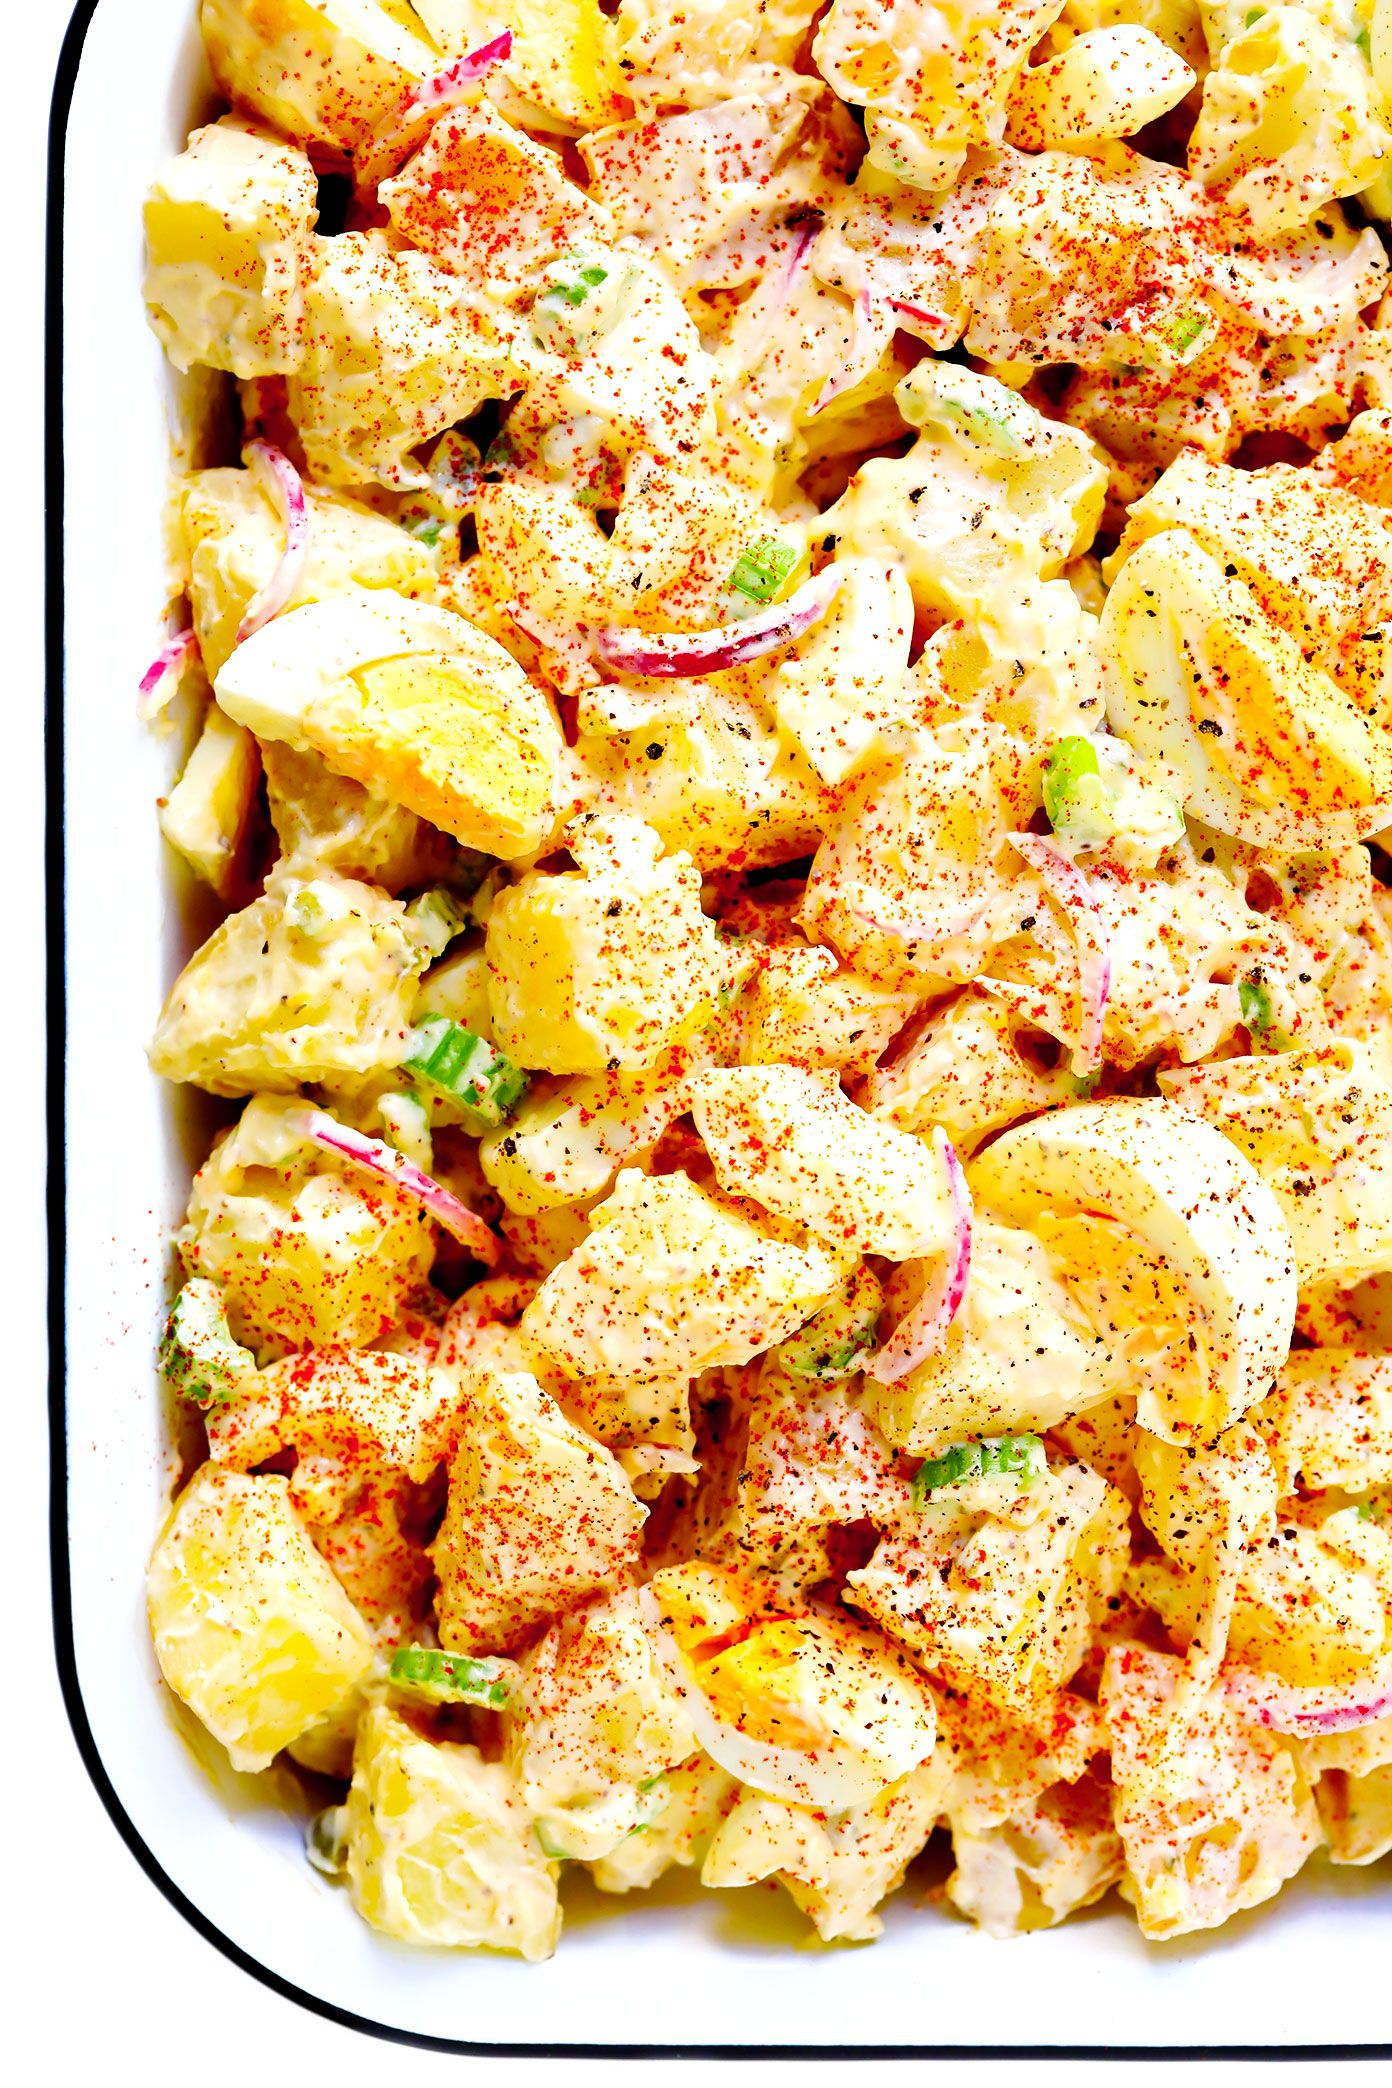 Best Potato Salad Recipe For A Crowd